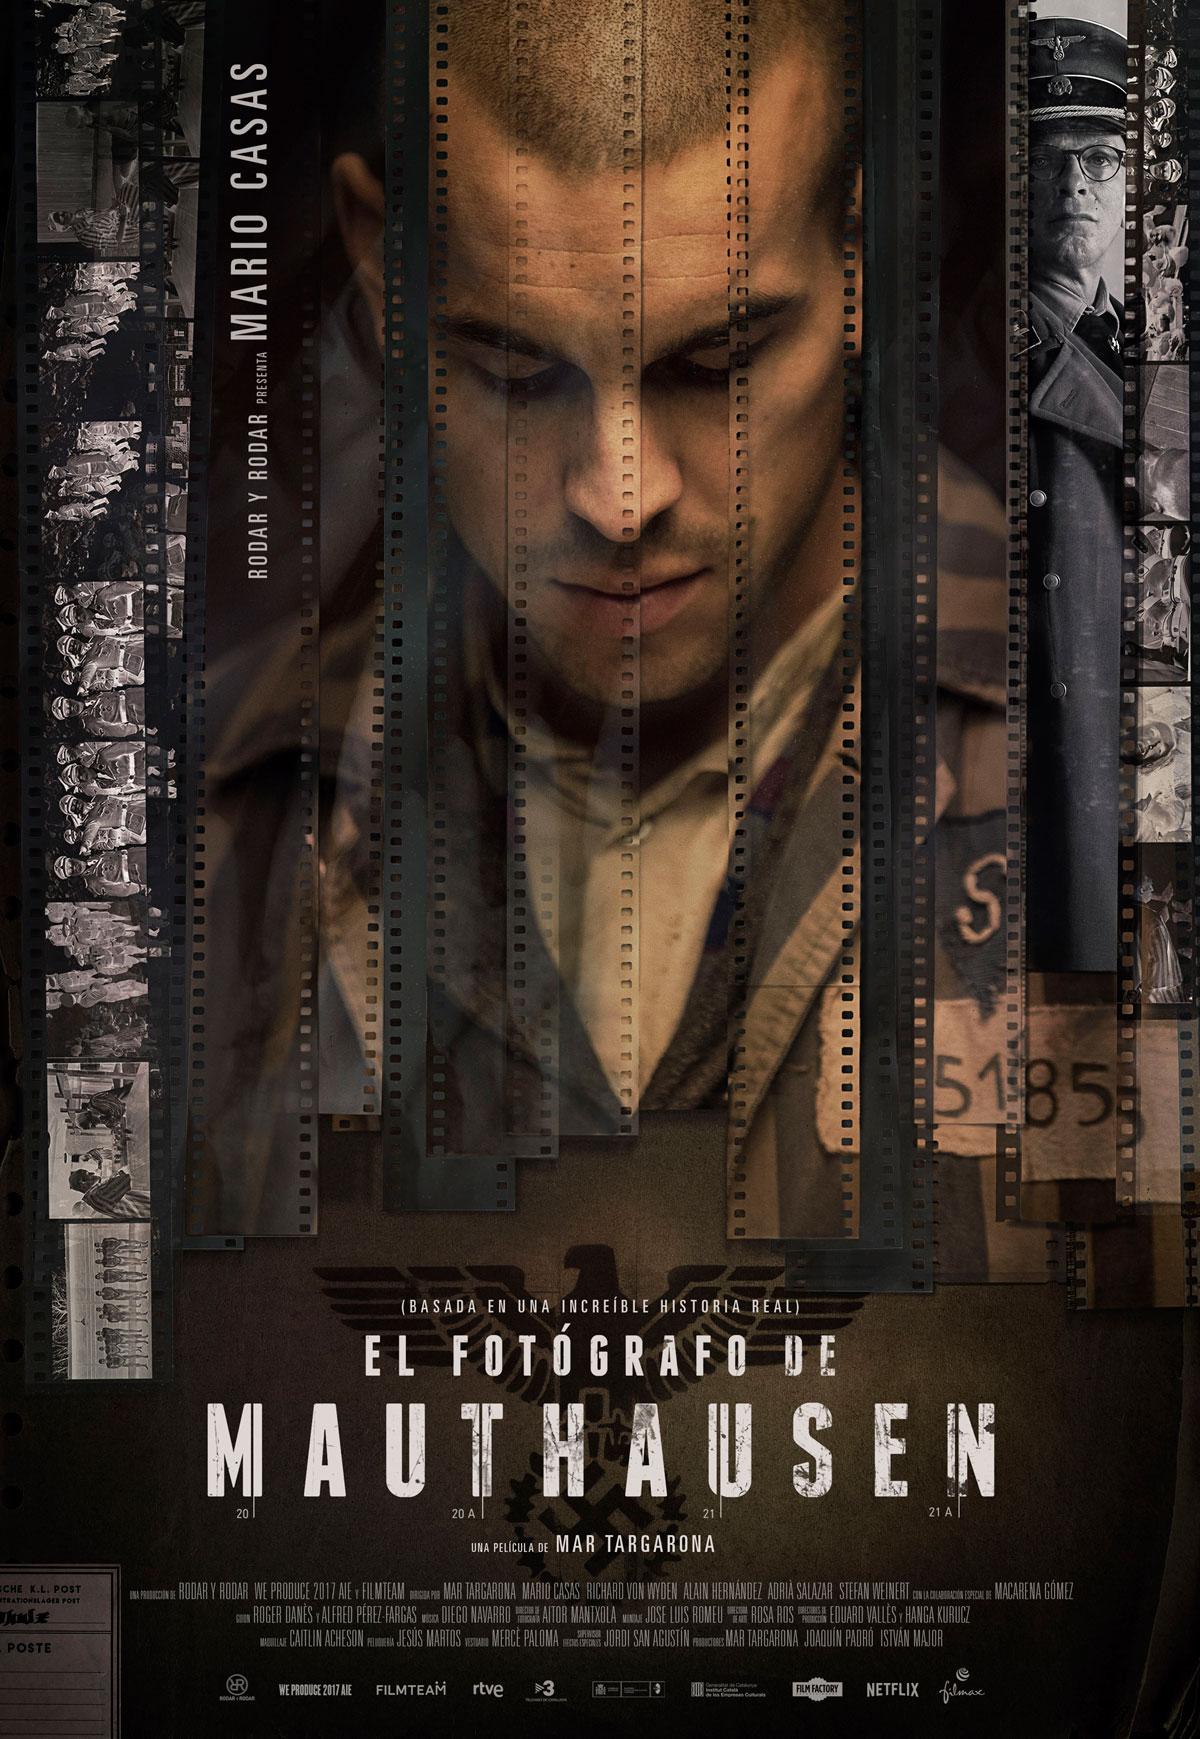 Le Photographe De Mauthausen Film : photographe, mauthausen, Photographe, Mauthausen, AlloCiné